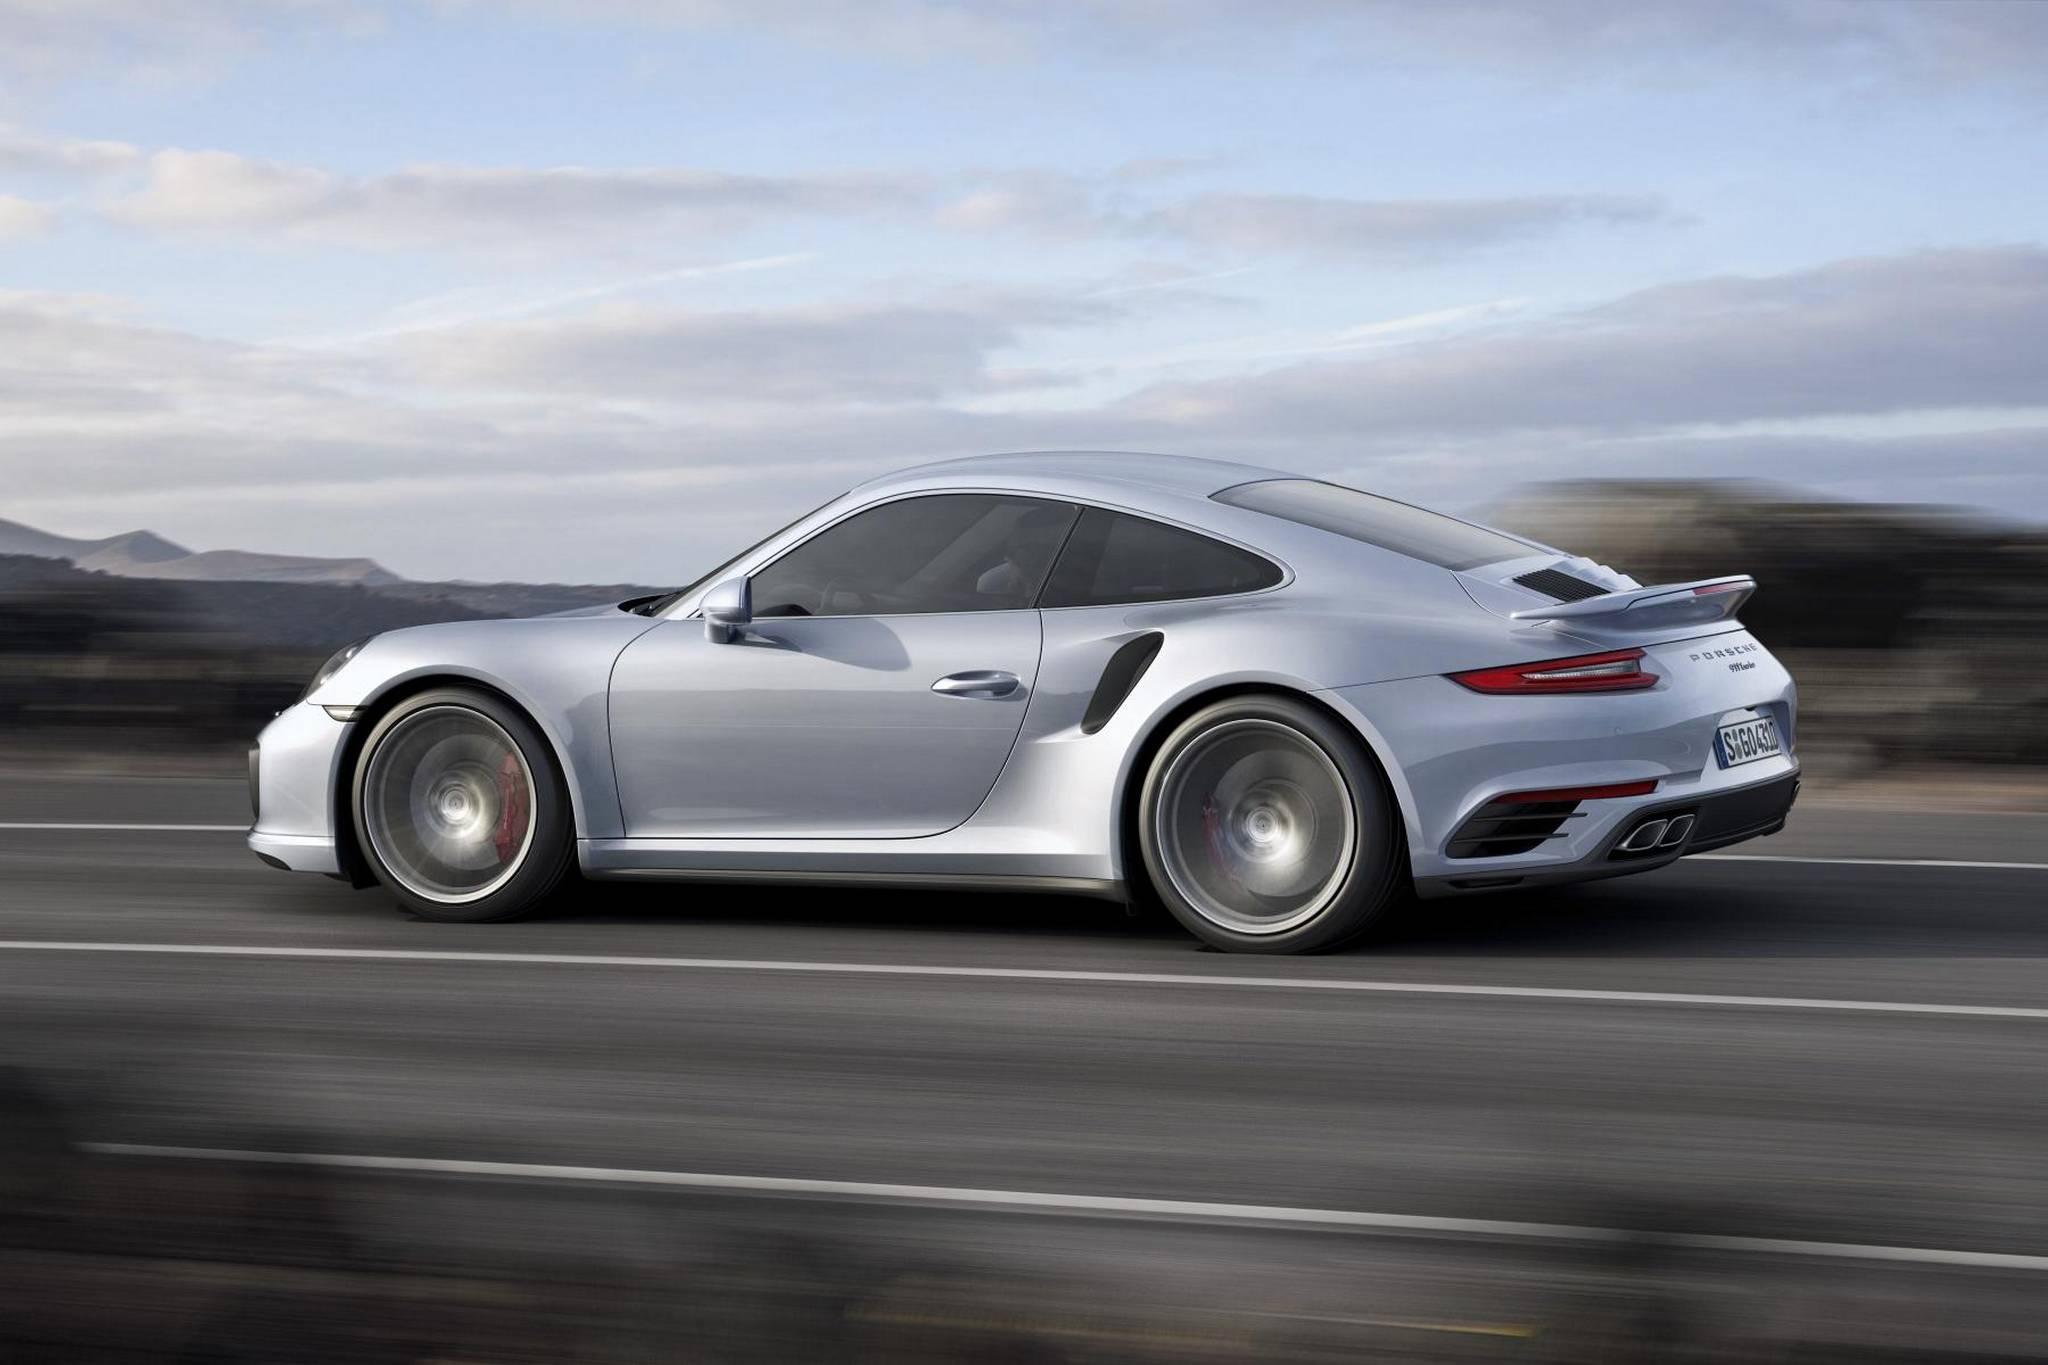 Best options on a porsche 911 turbo